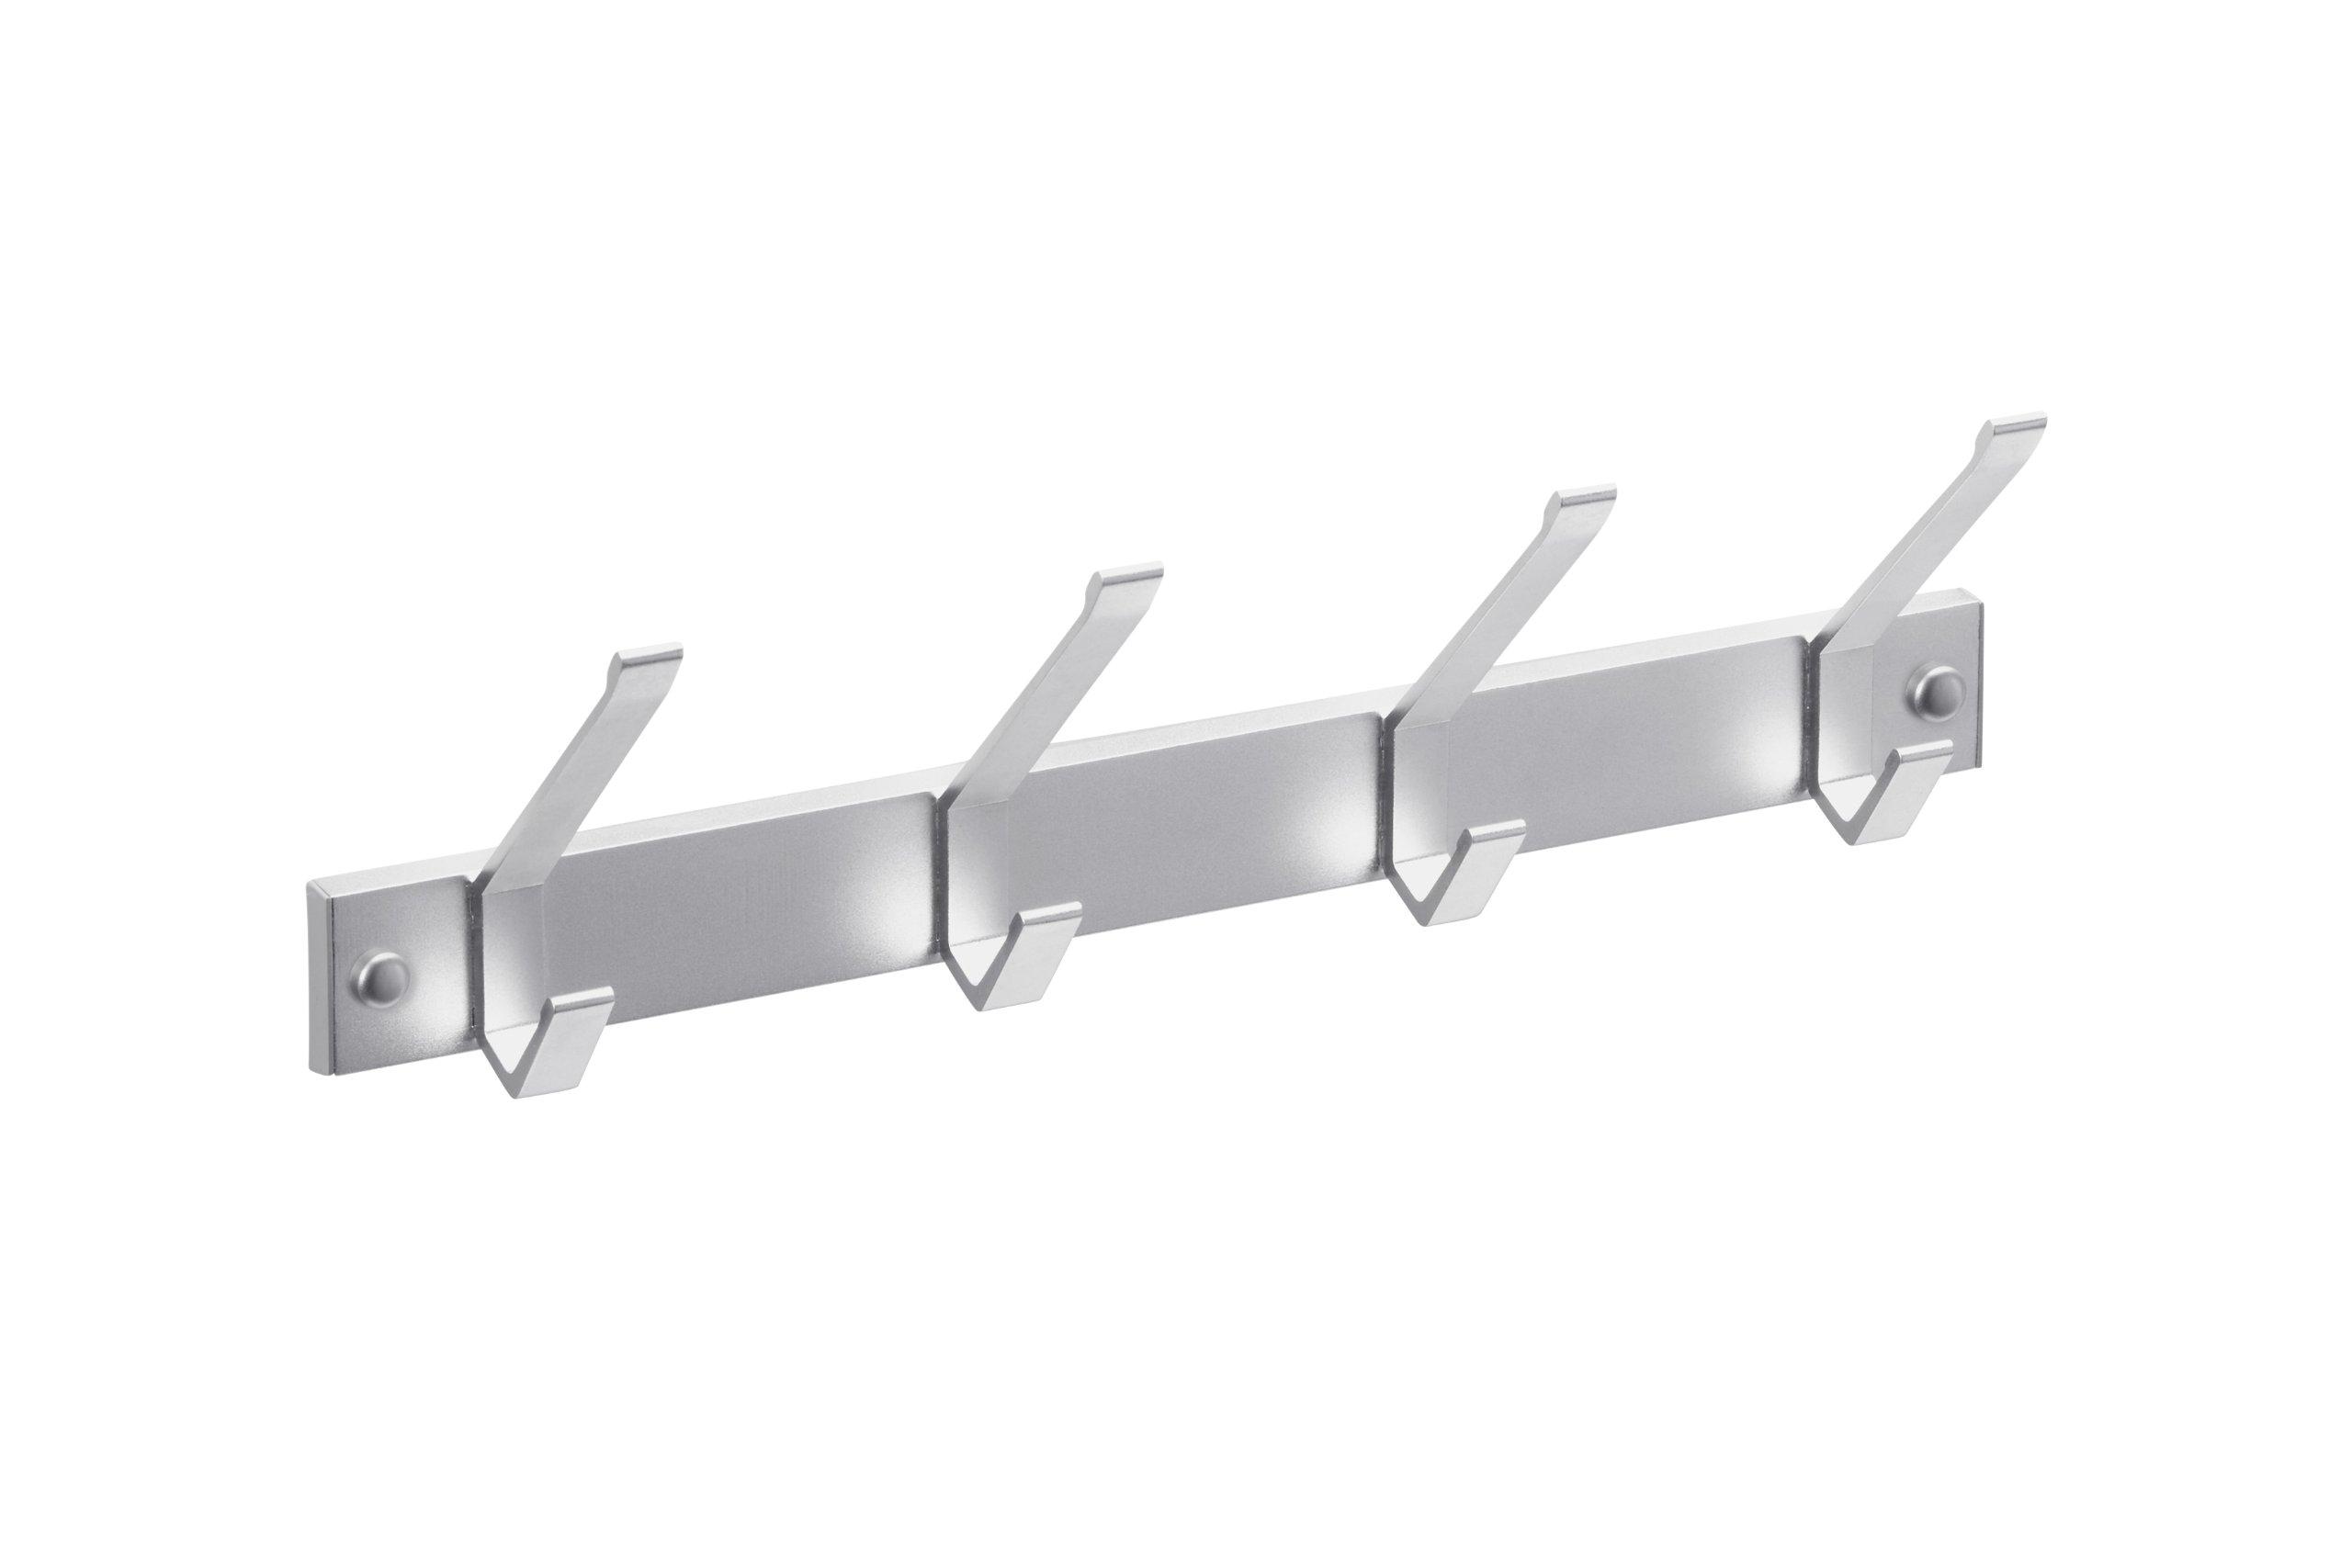 Meister 262839 Aluminium Panel with 4 Hooks